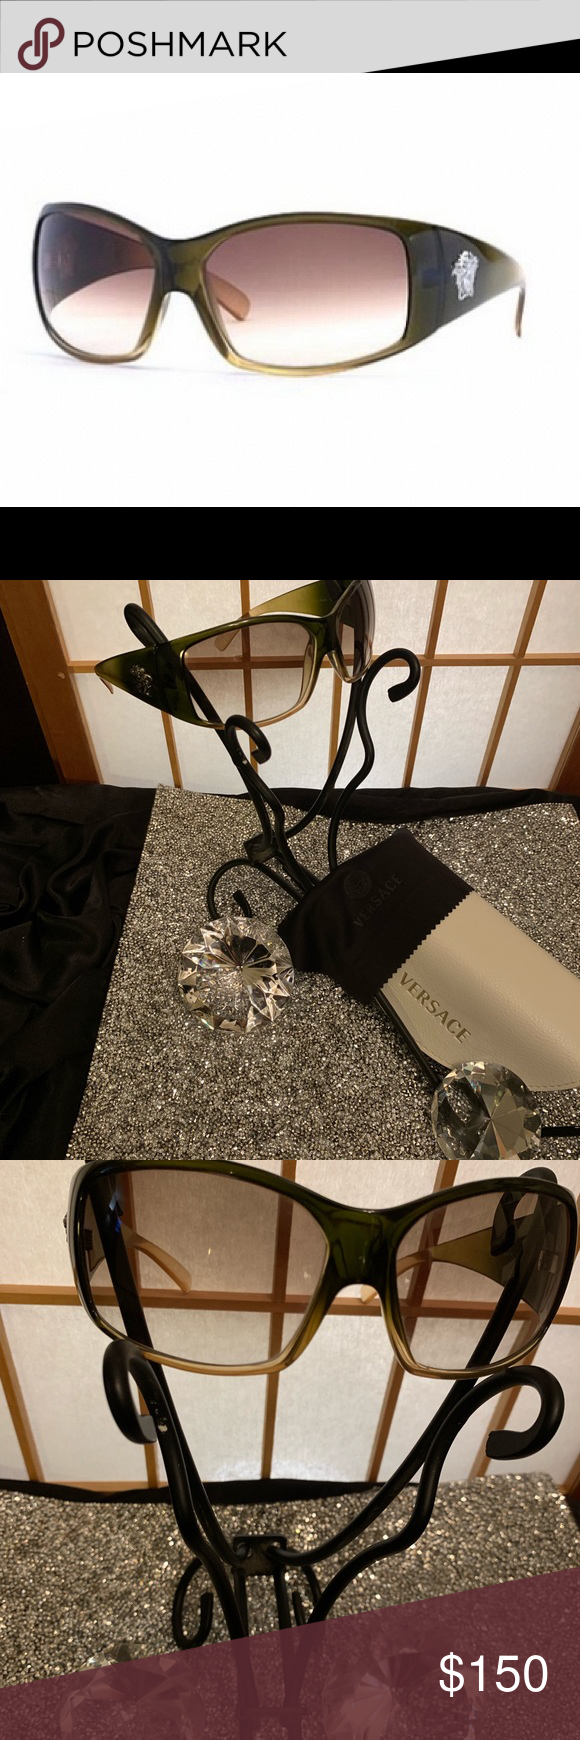 VERACE MADUSA HEAD SUNGLASSES Wunderschöne Versace Design-Sonnenbrille Madusa Head Br …